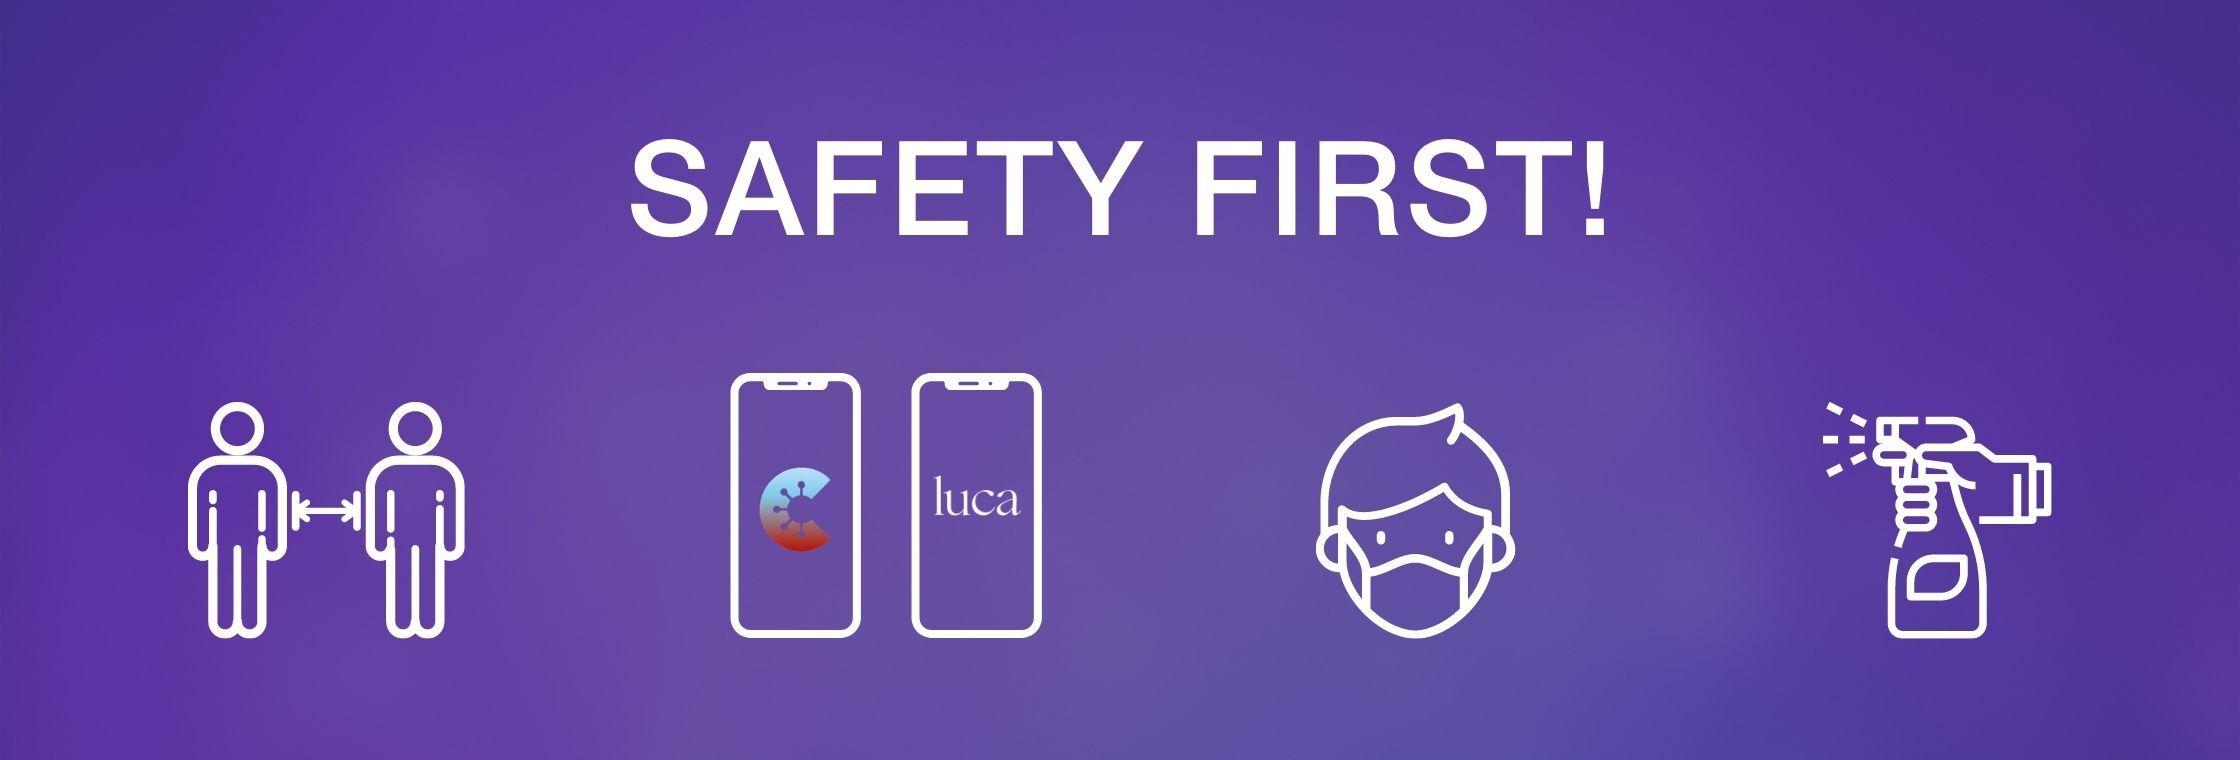 Icons Hygienekonzept Abstand CWA App LUCA APP Maske Desinfektion